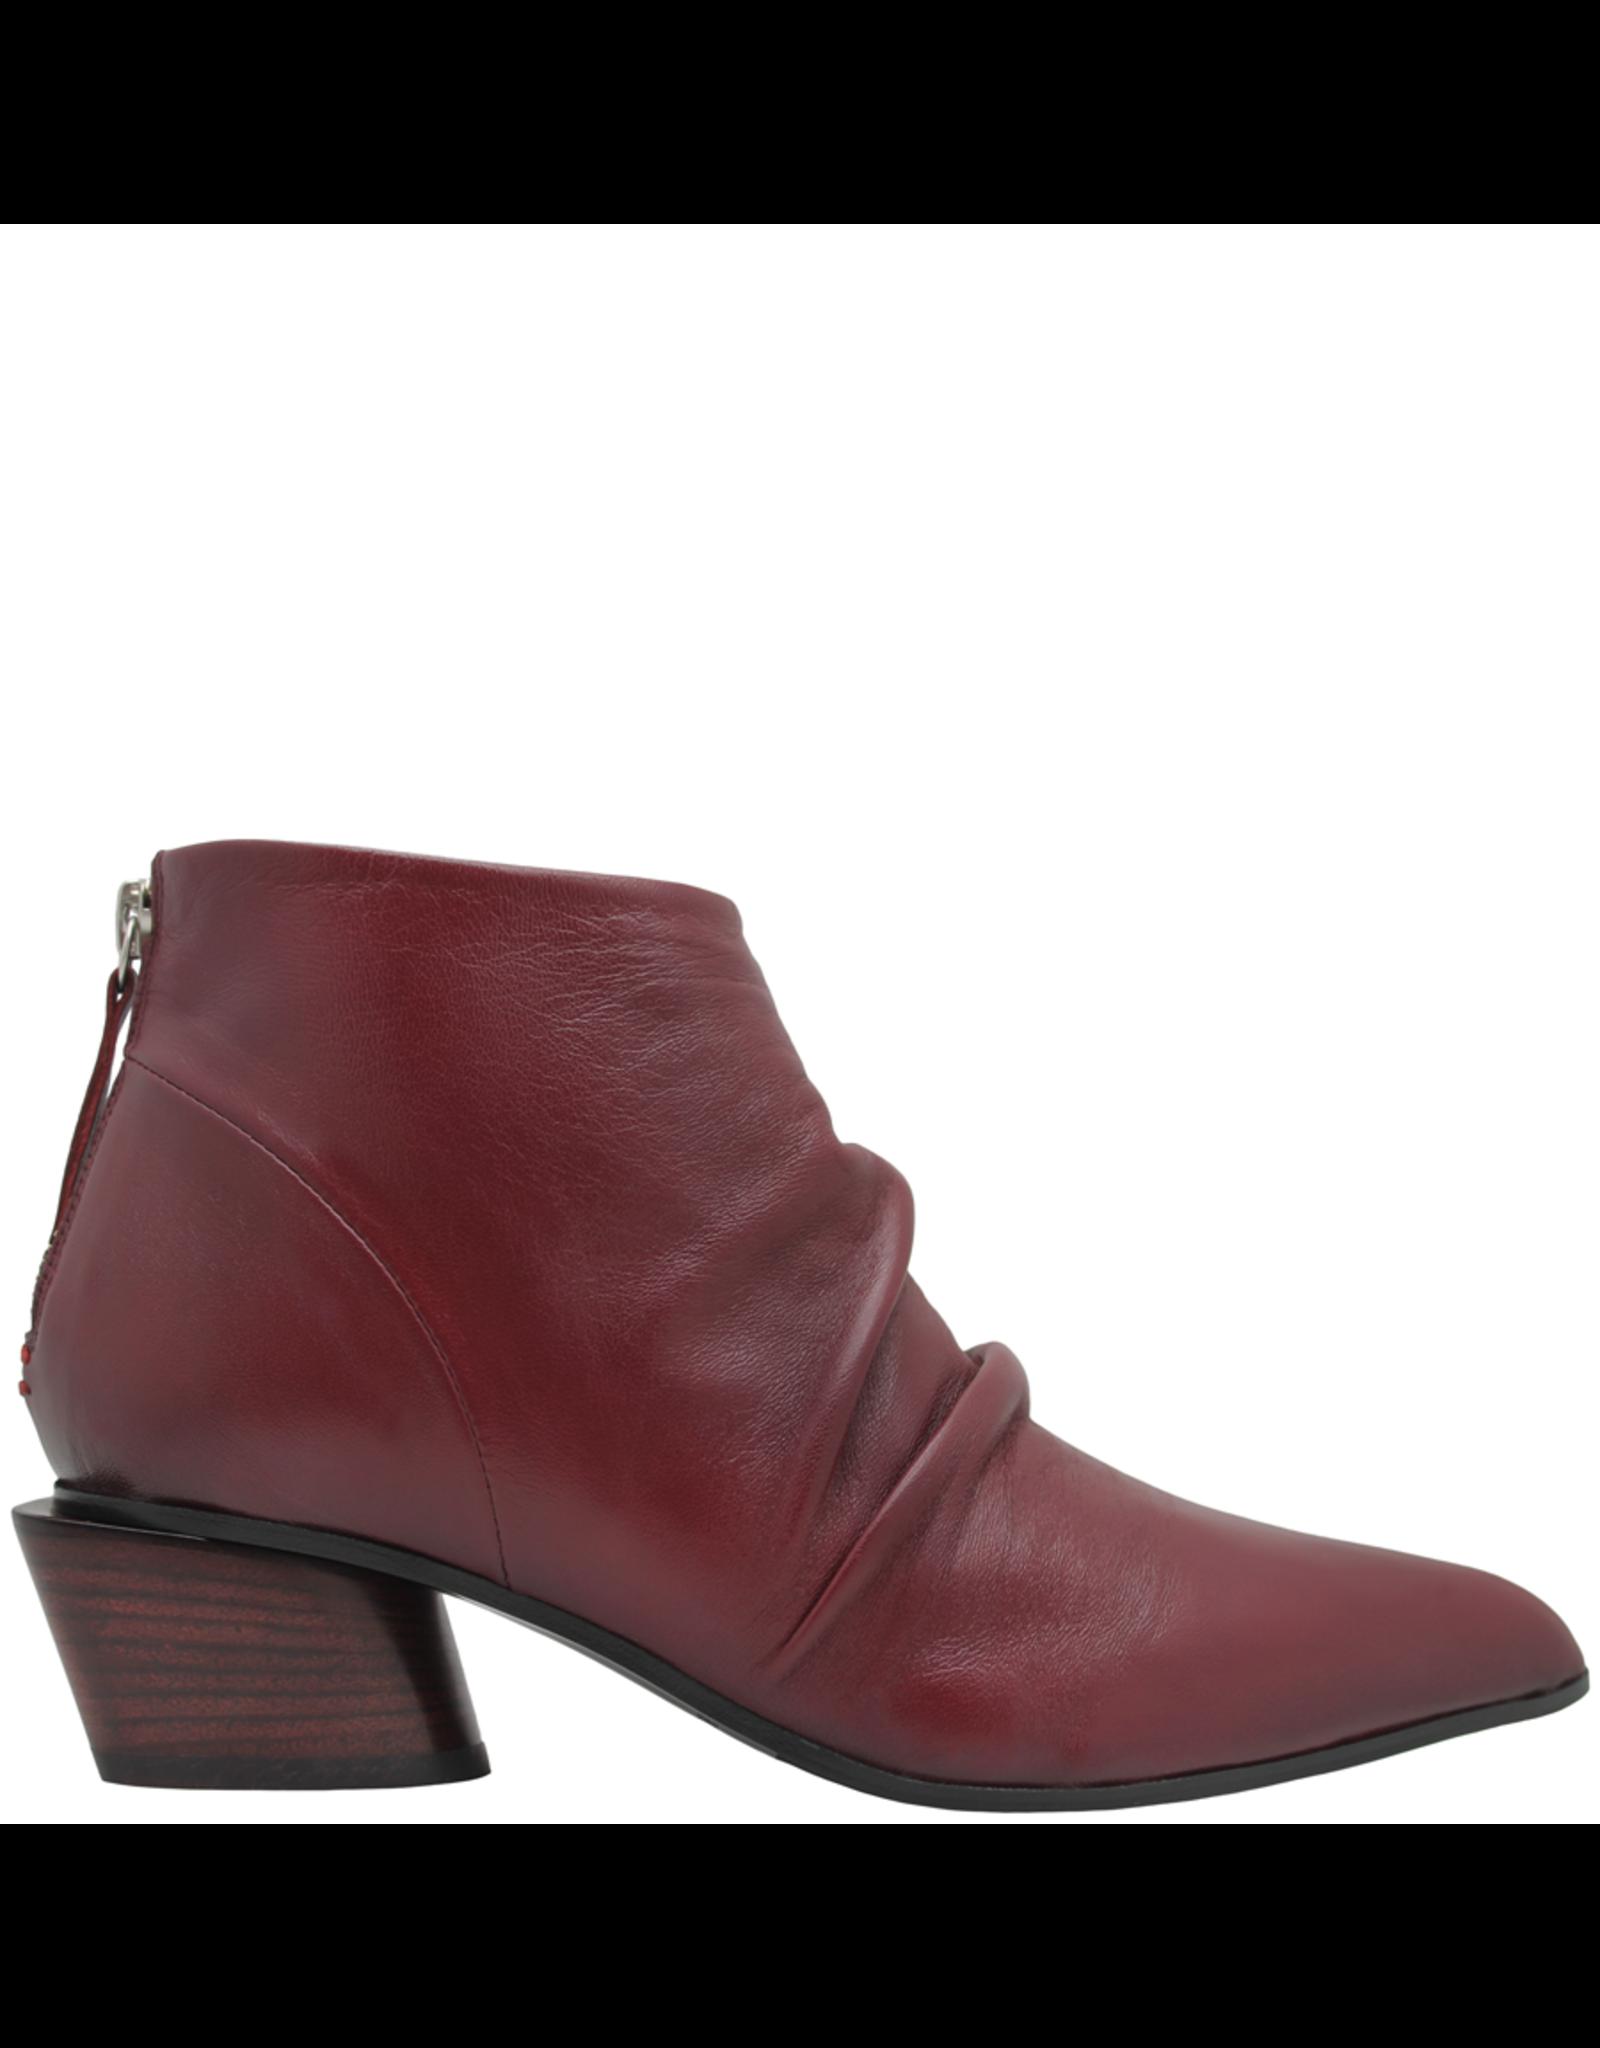 Halmanera Halmanera Wine Point Toe Ankle Boot With Back Zipper 2027